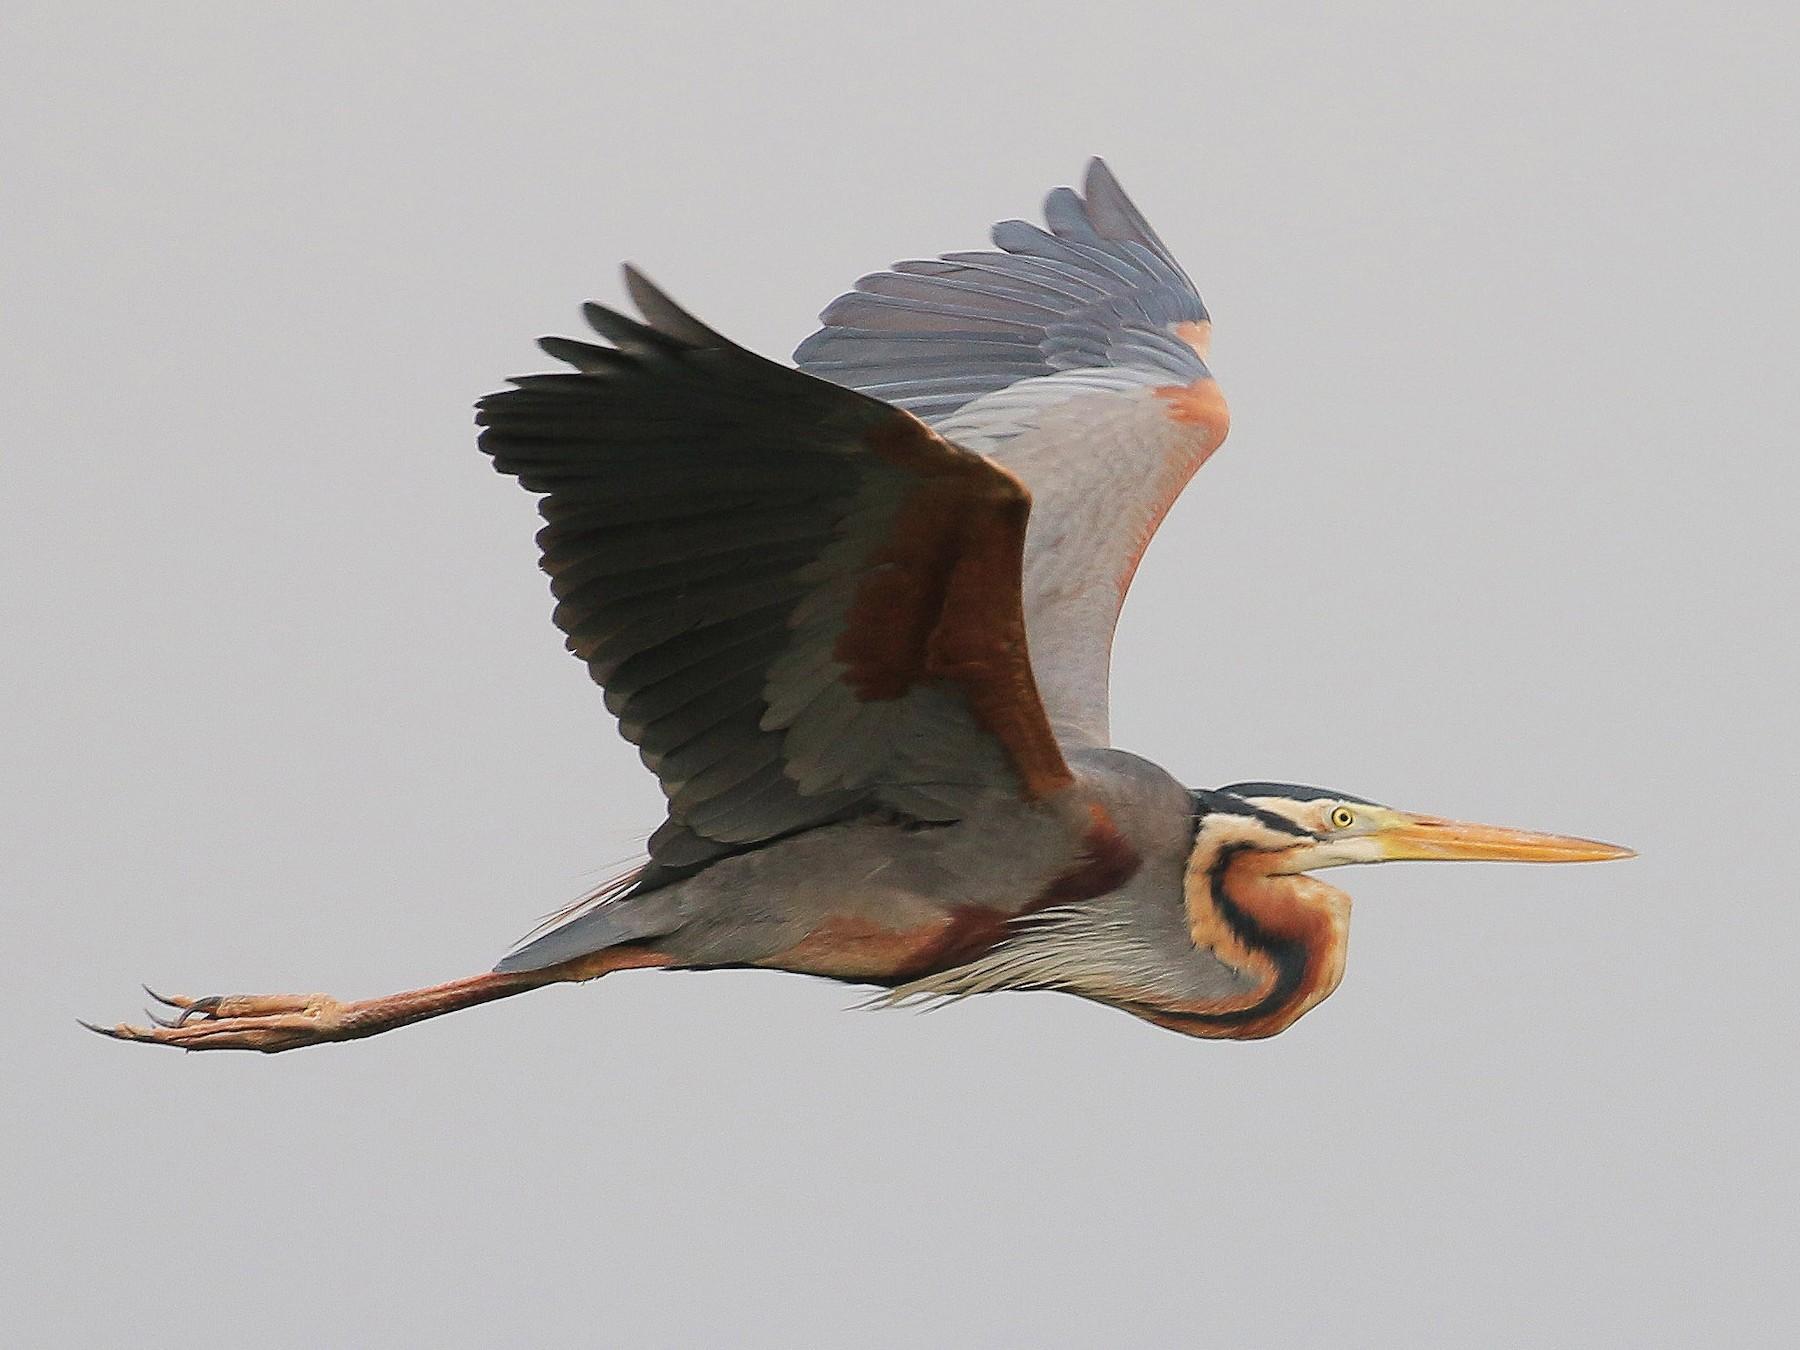 Purple Heron - Neoh Hor Kee